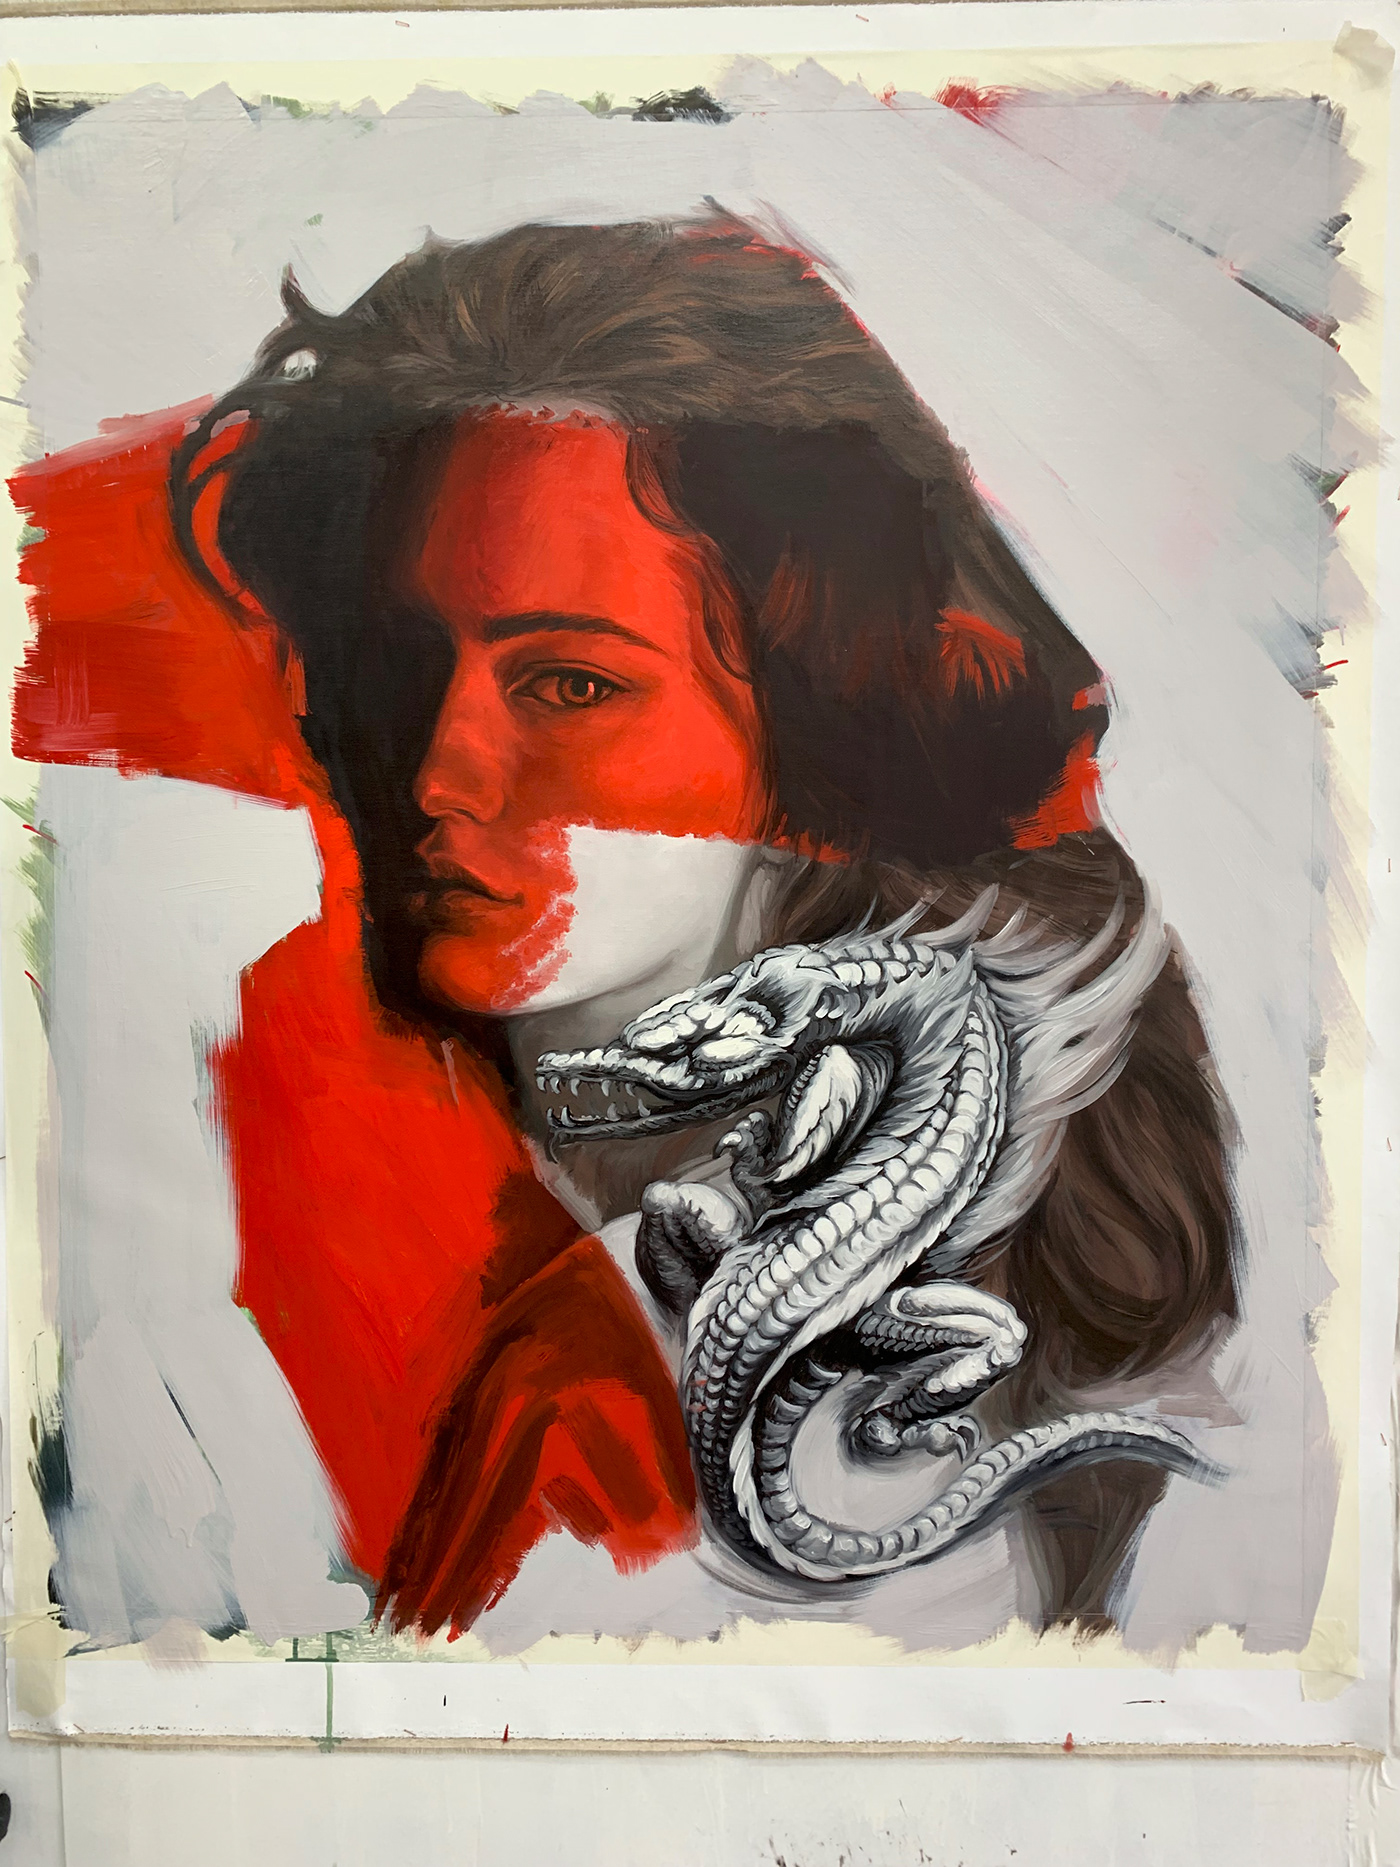 Bellas artes fine art Illustrator Mural oil oil on canvas painting   pintura streetart